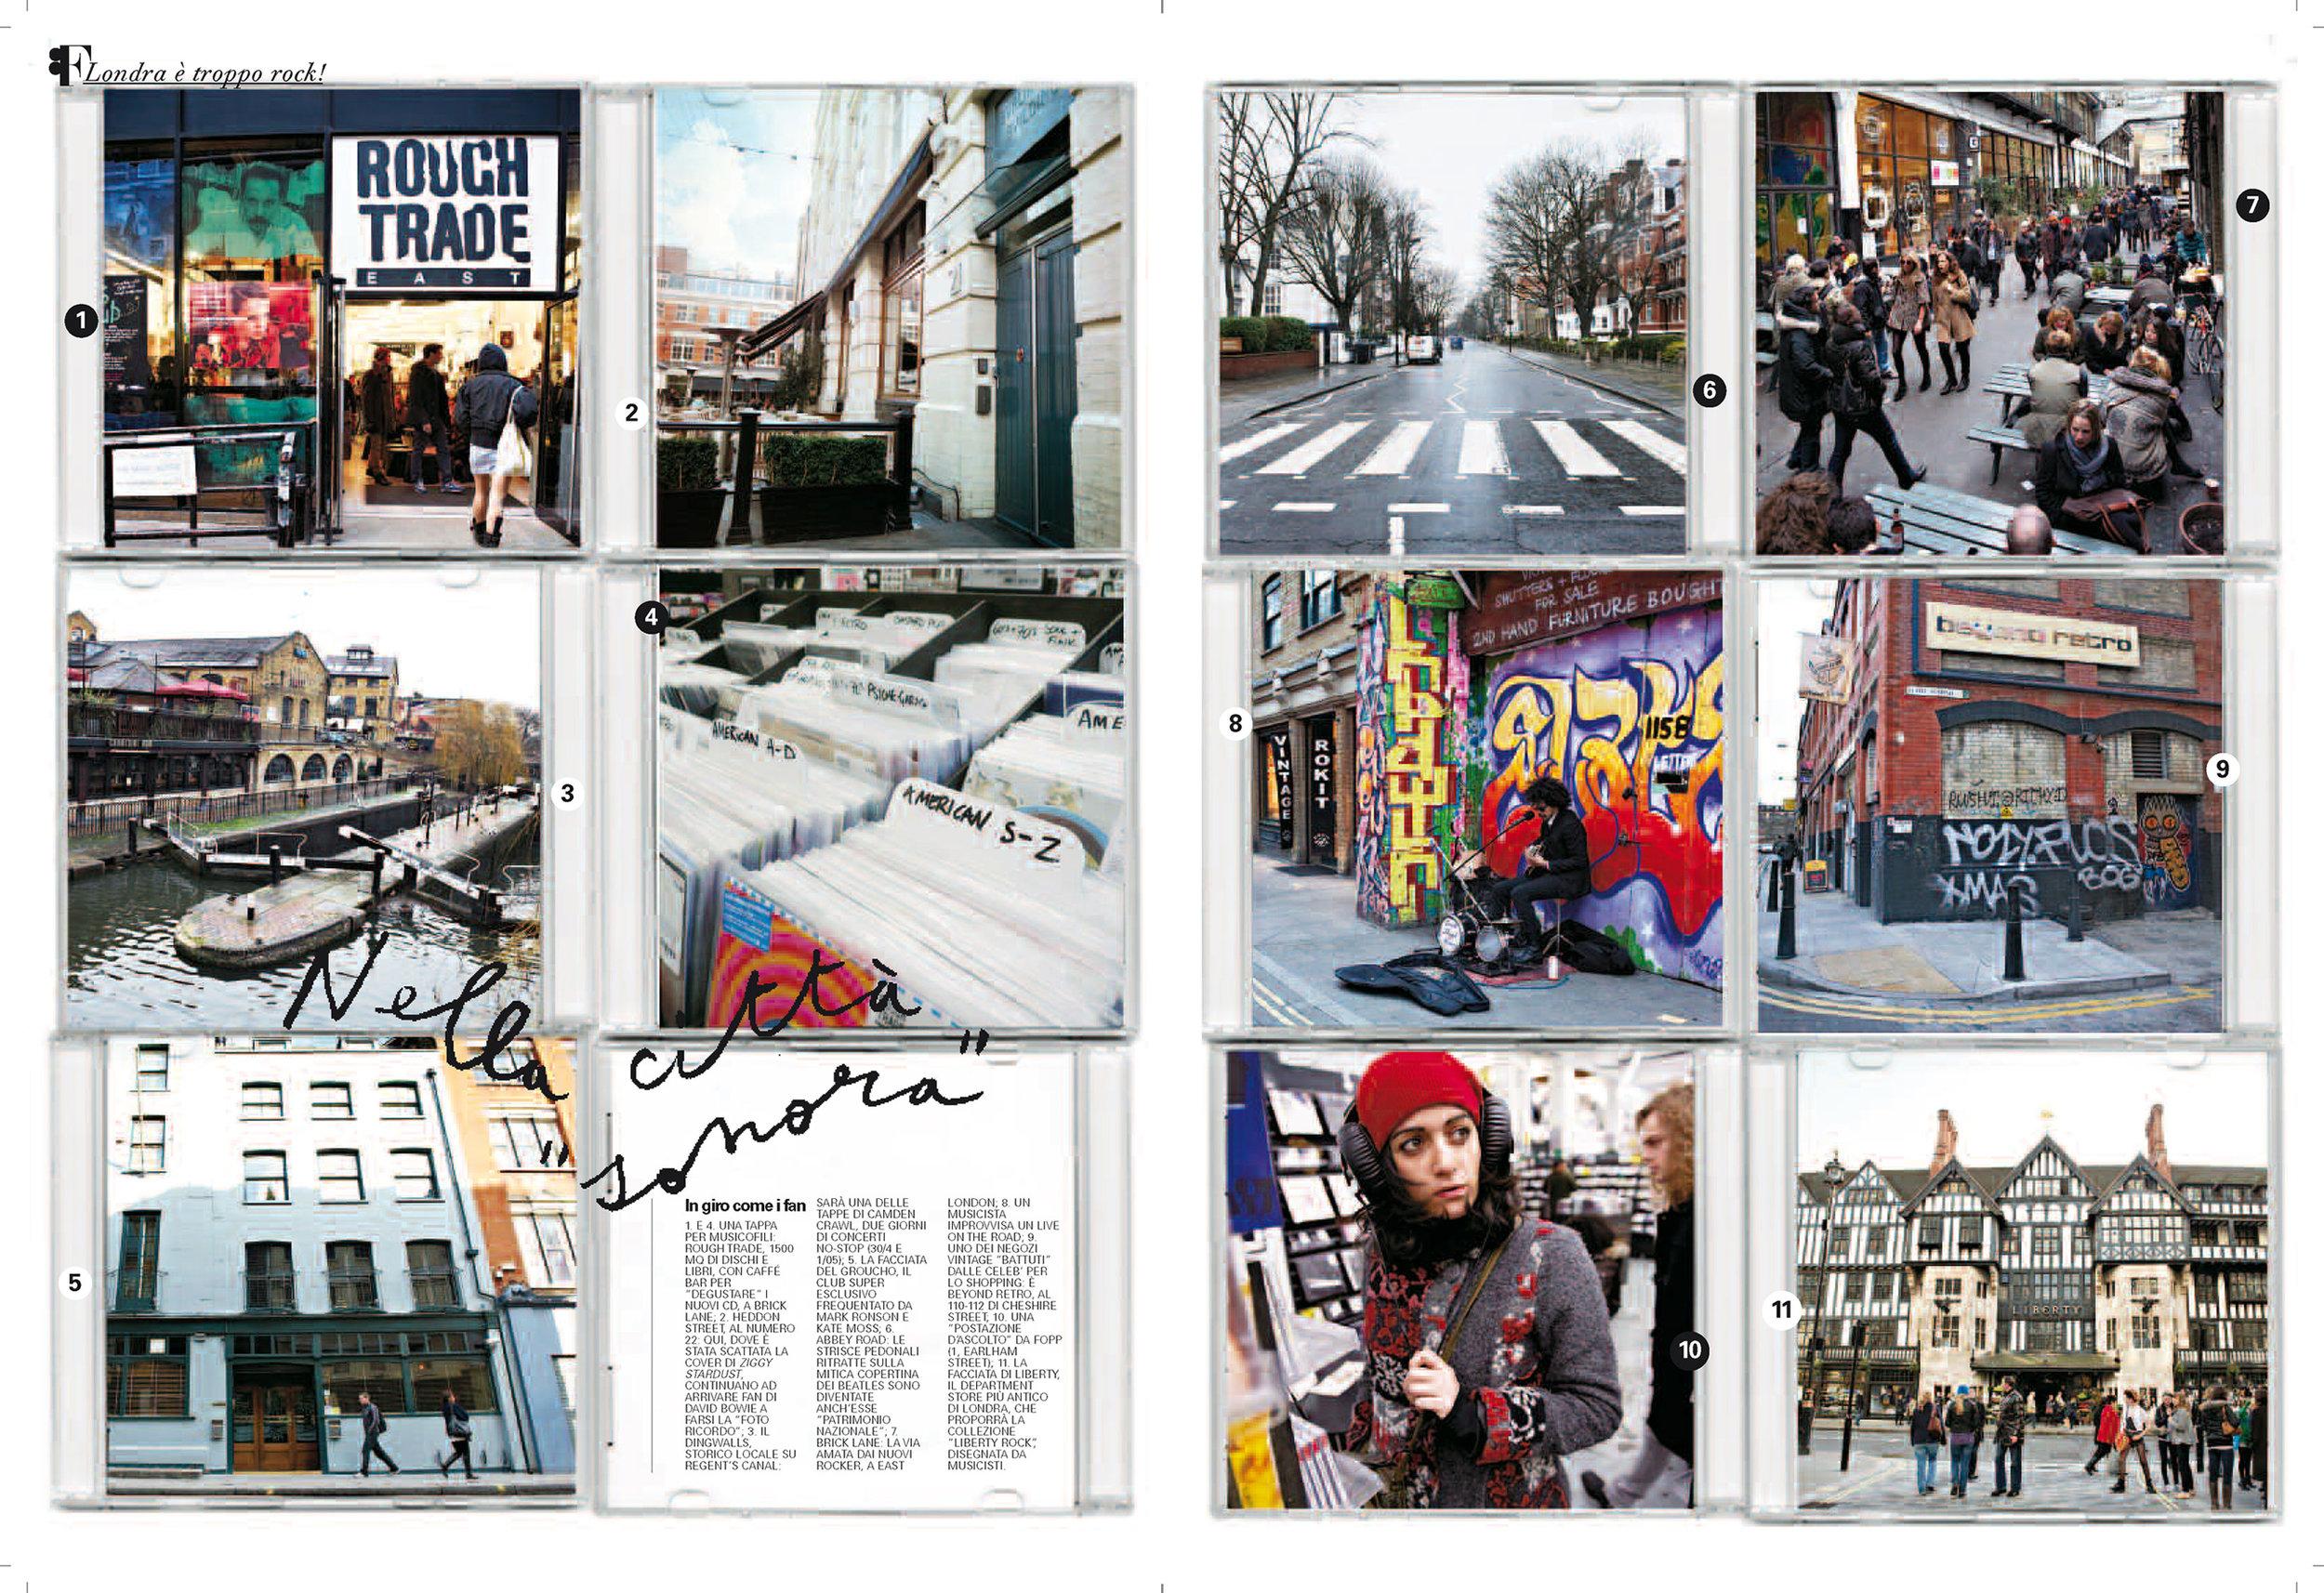 Flair magazine: London rocks reportage